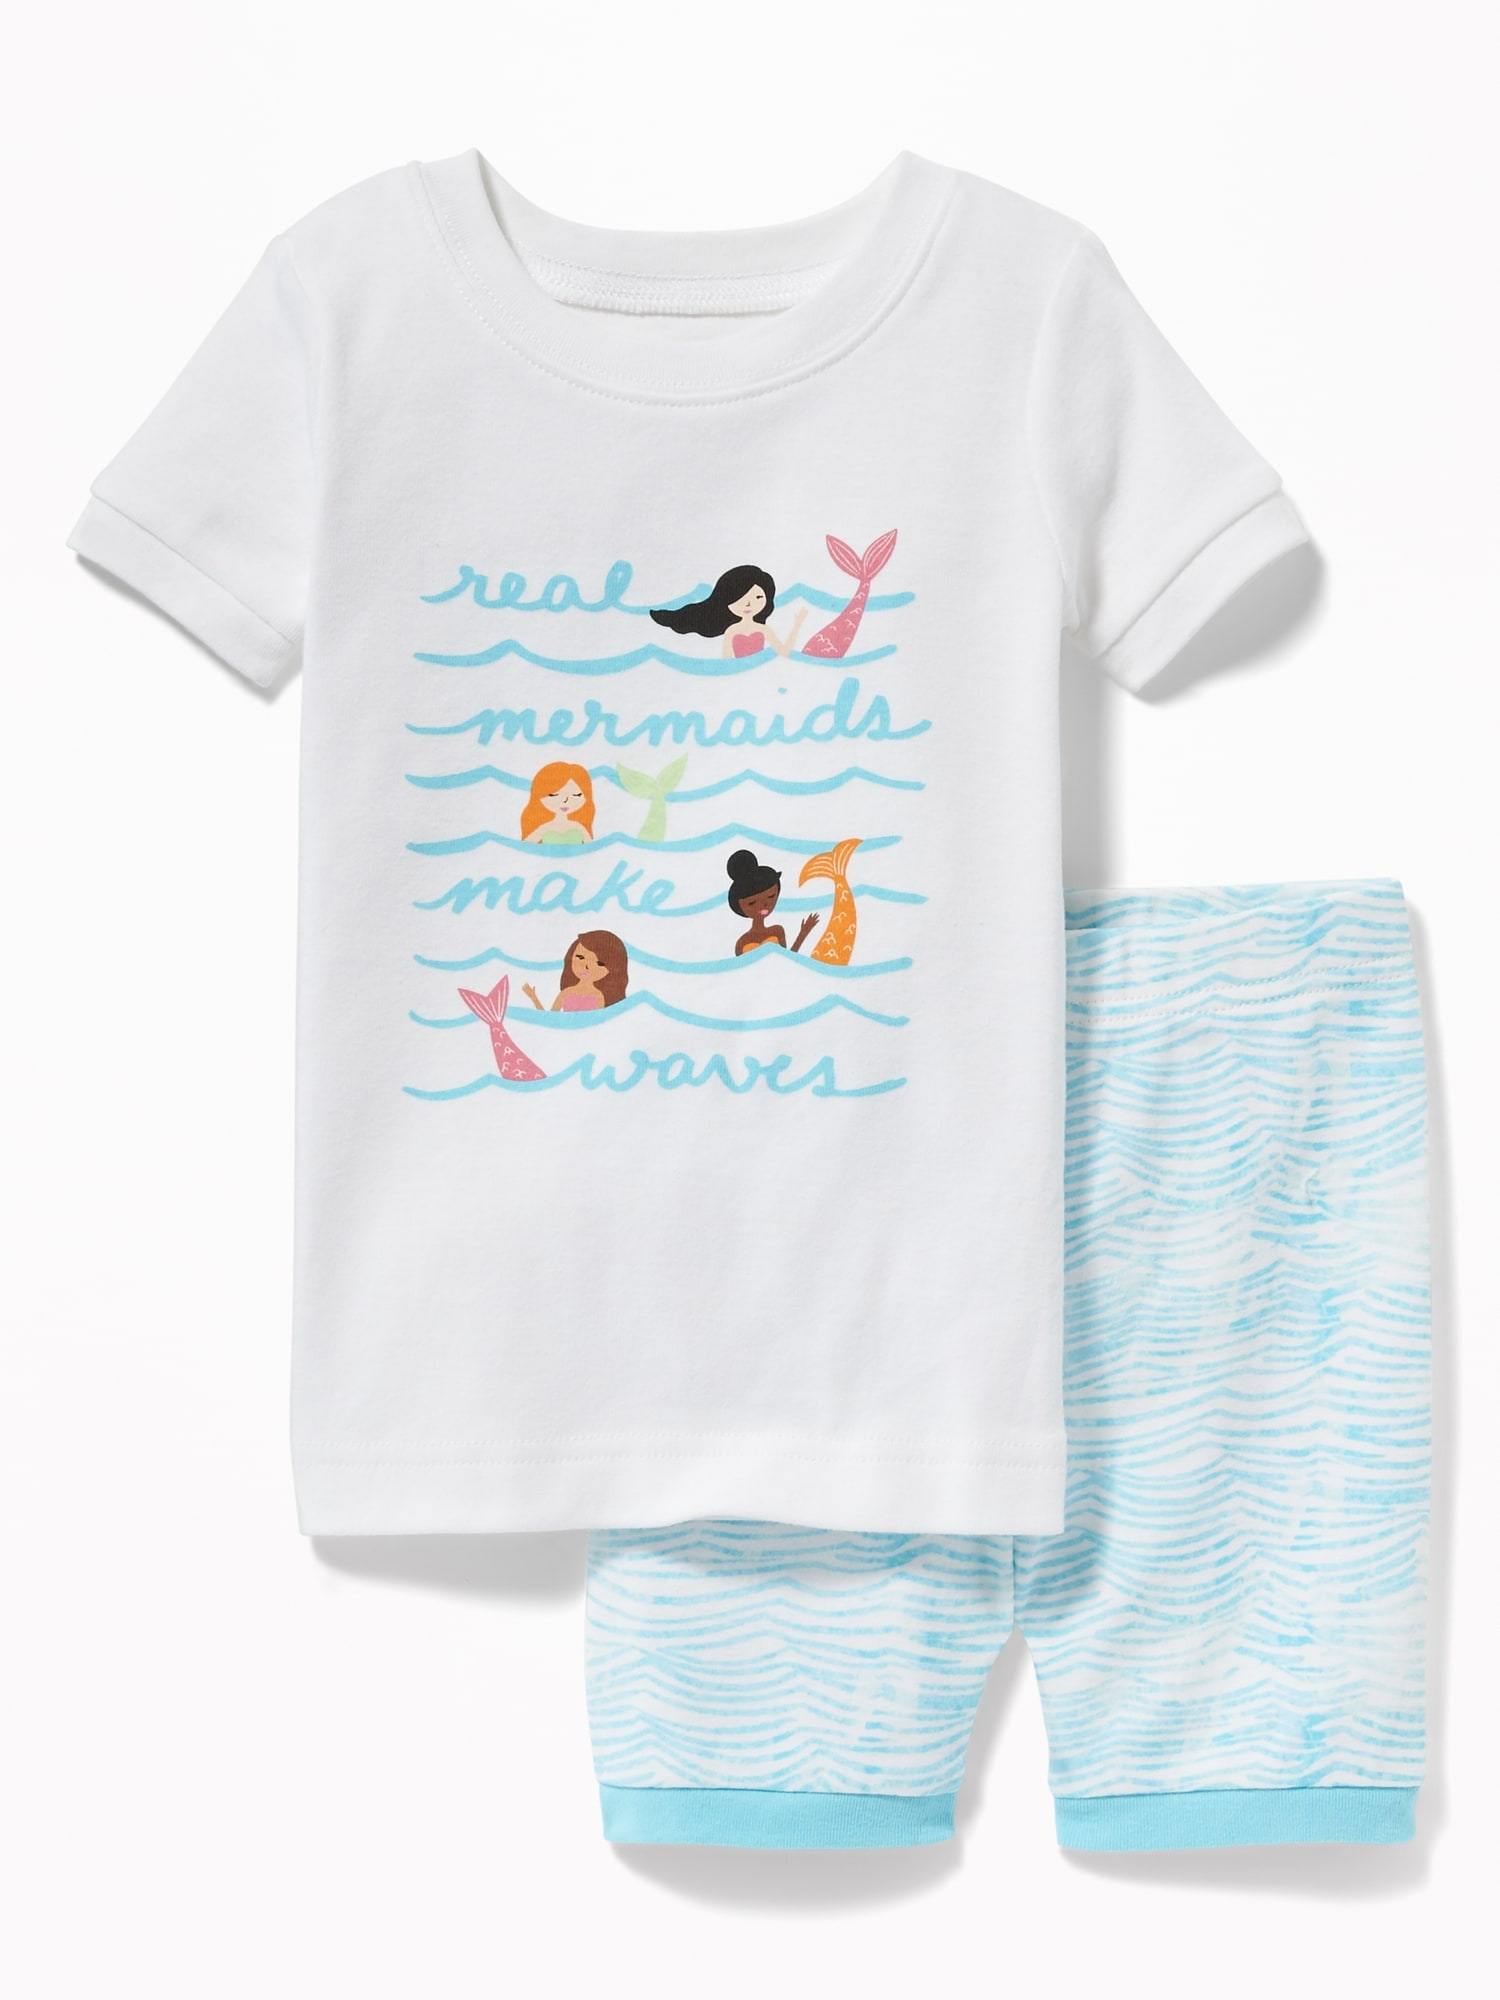 21aef9172 Real Mermaids Make Waves